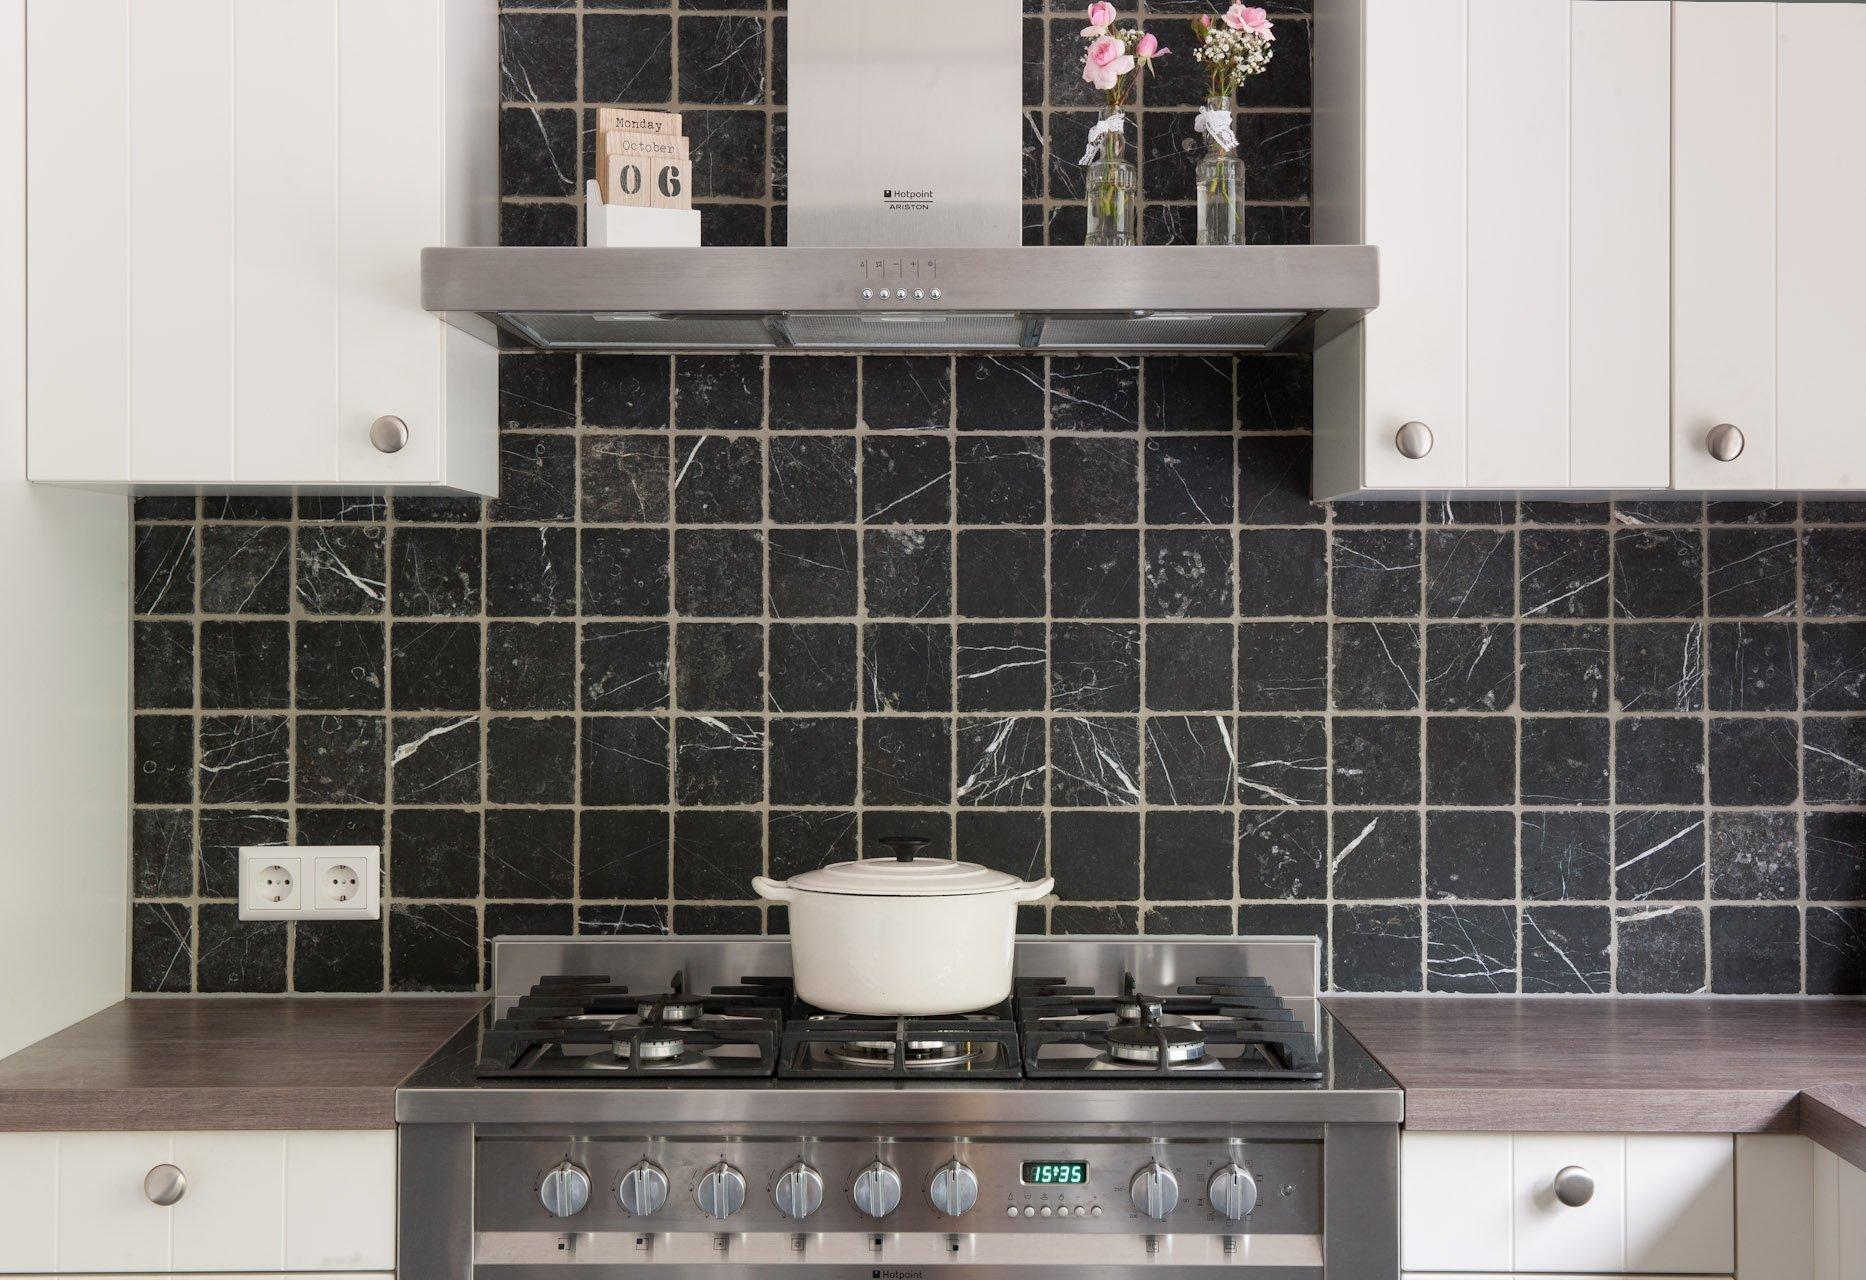 keuken wandtegels oud hollands : Idee Tegels Keuken